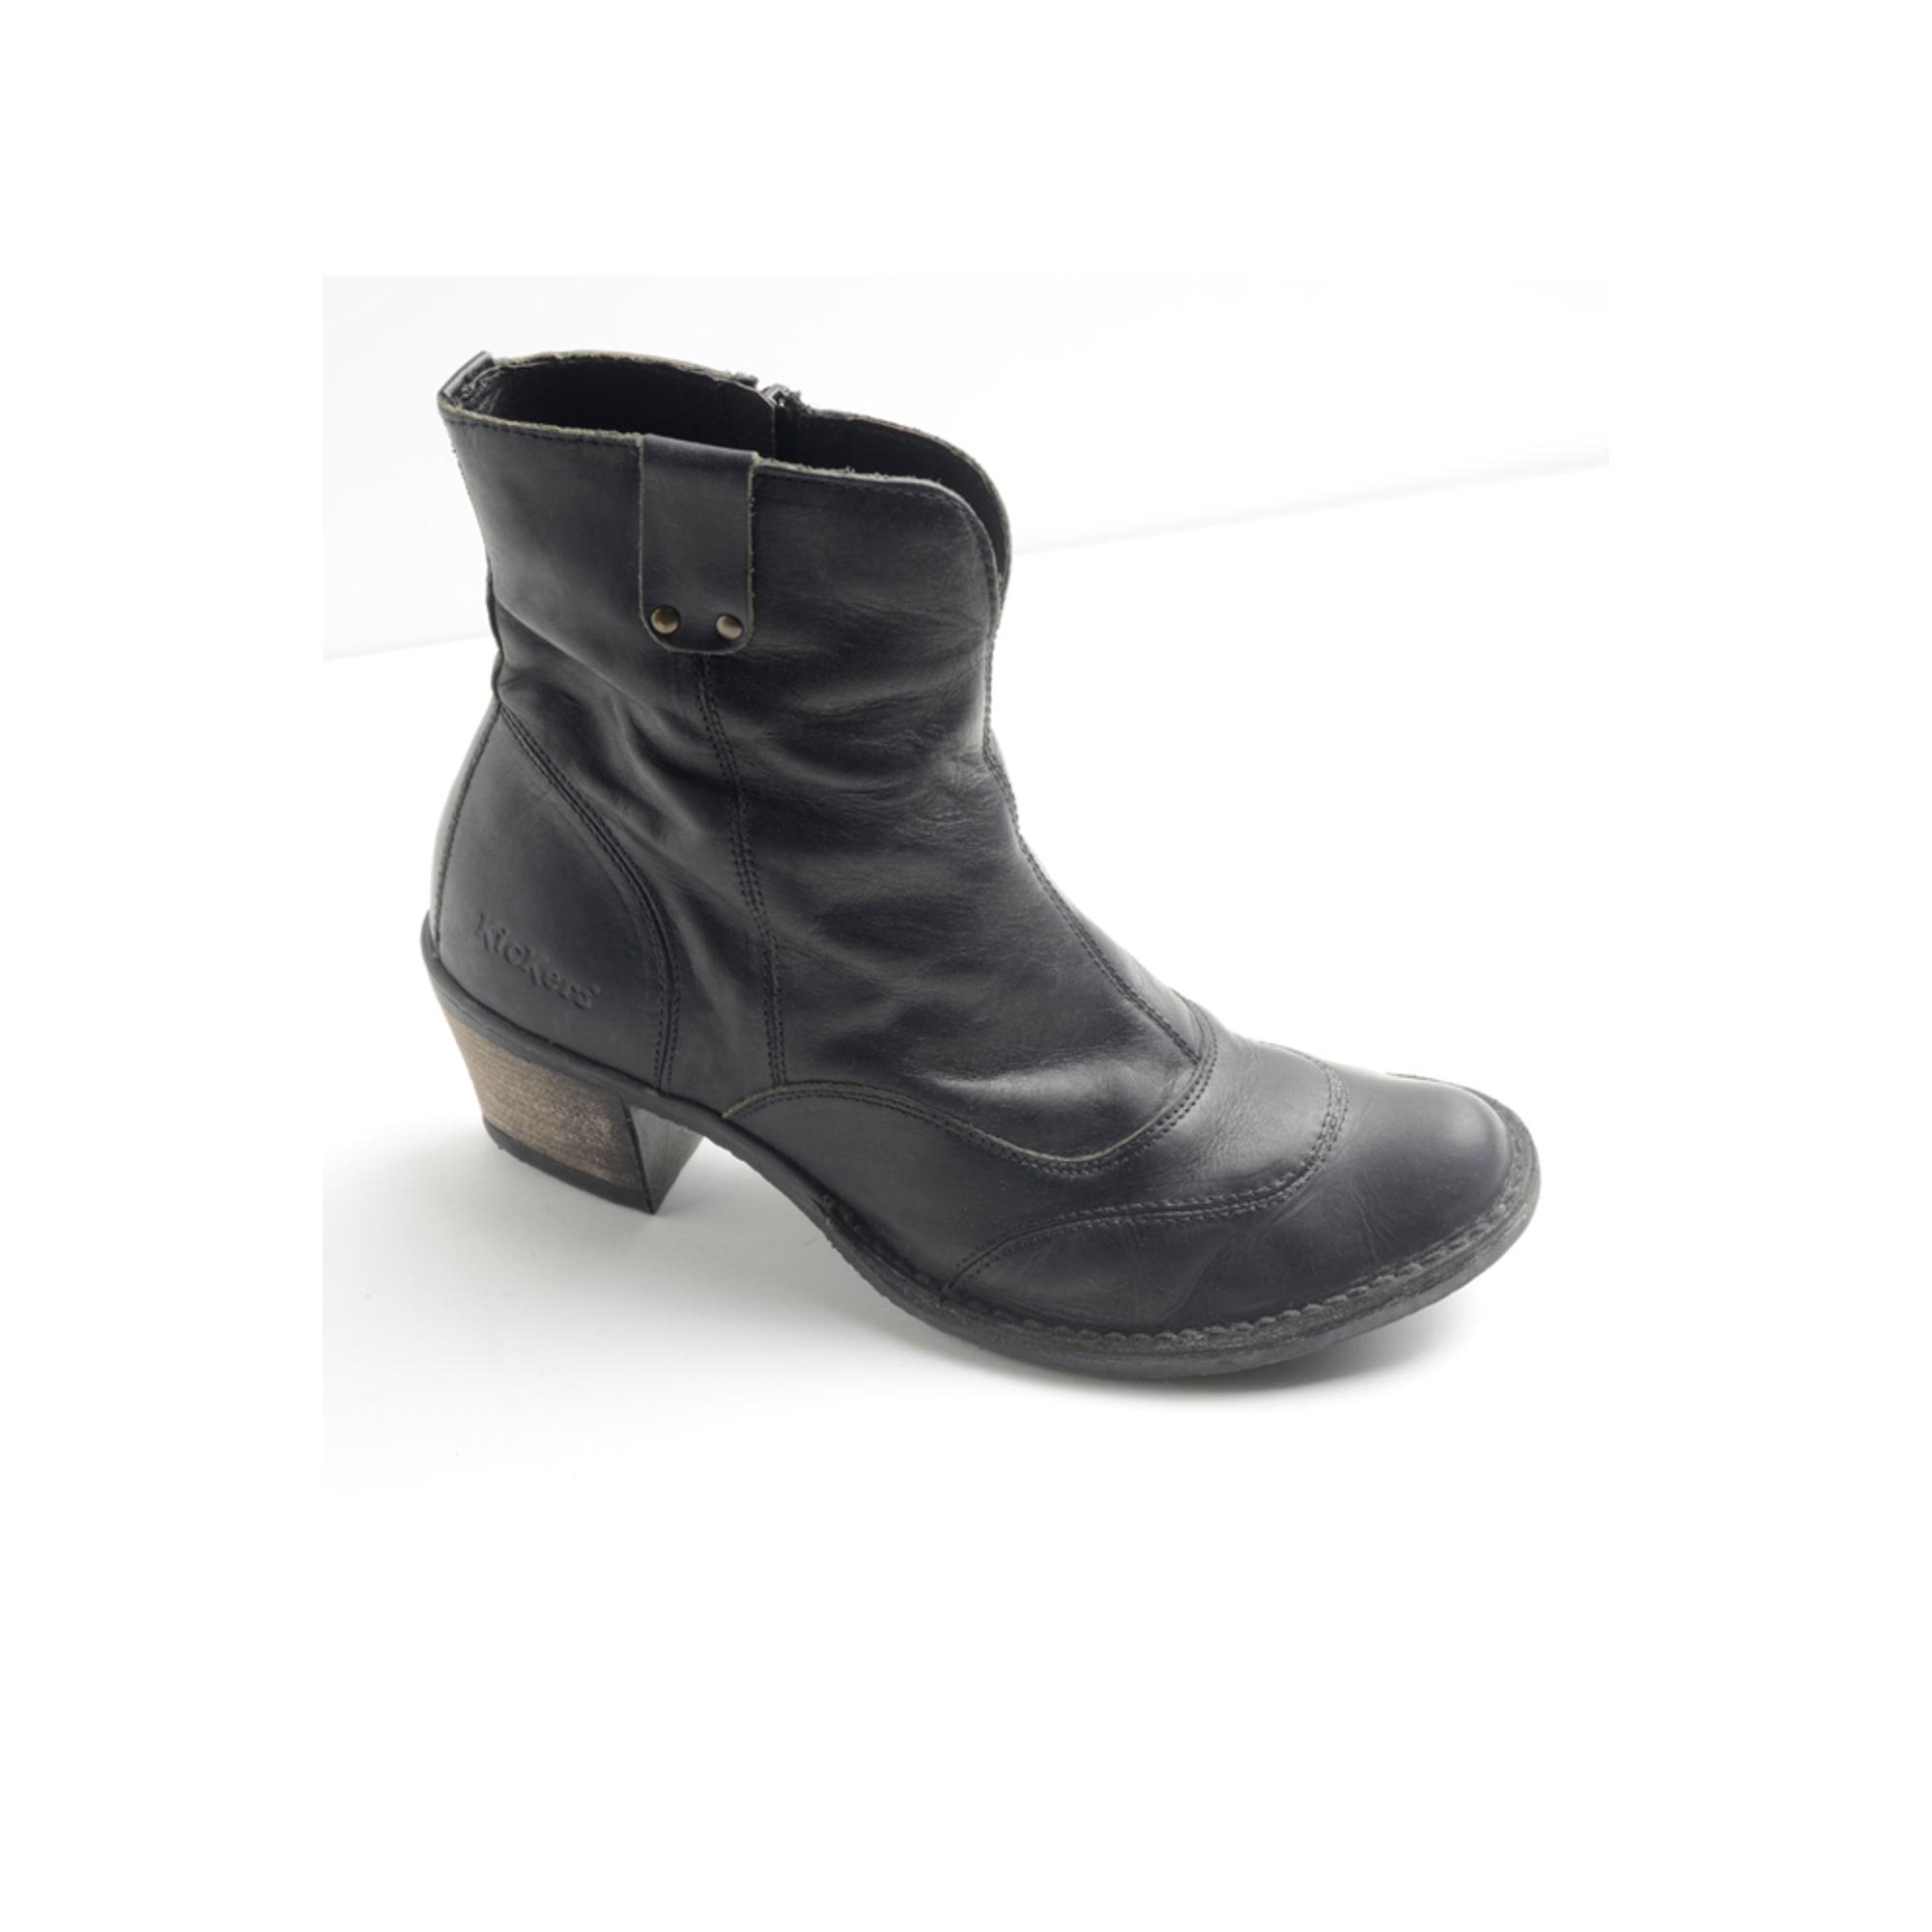 Bottines amp  low boots à talons KICKERS cuir marron 38 YpyGuER ... a575c99be4dc